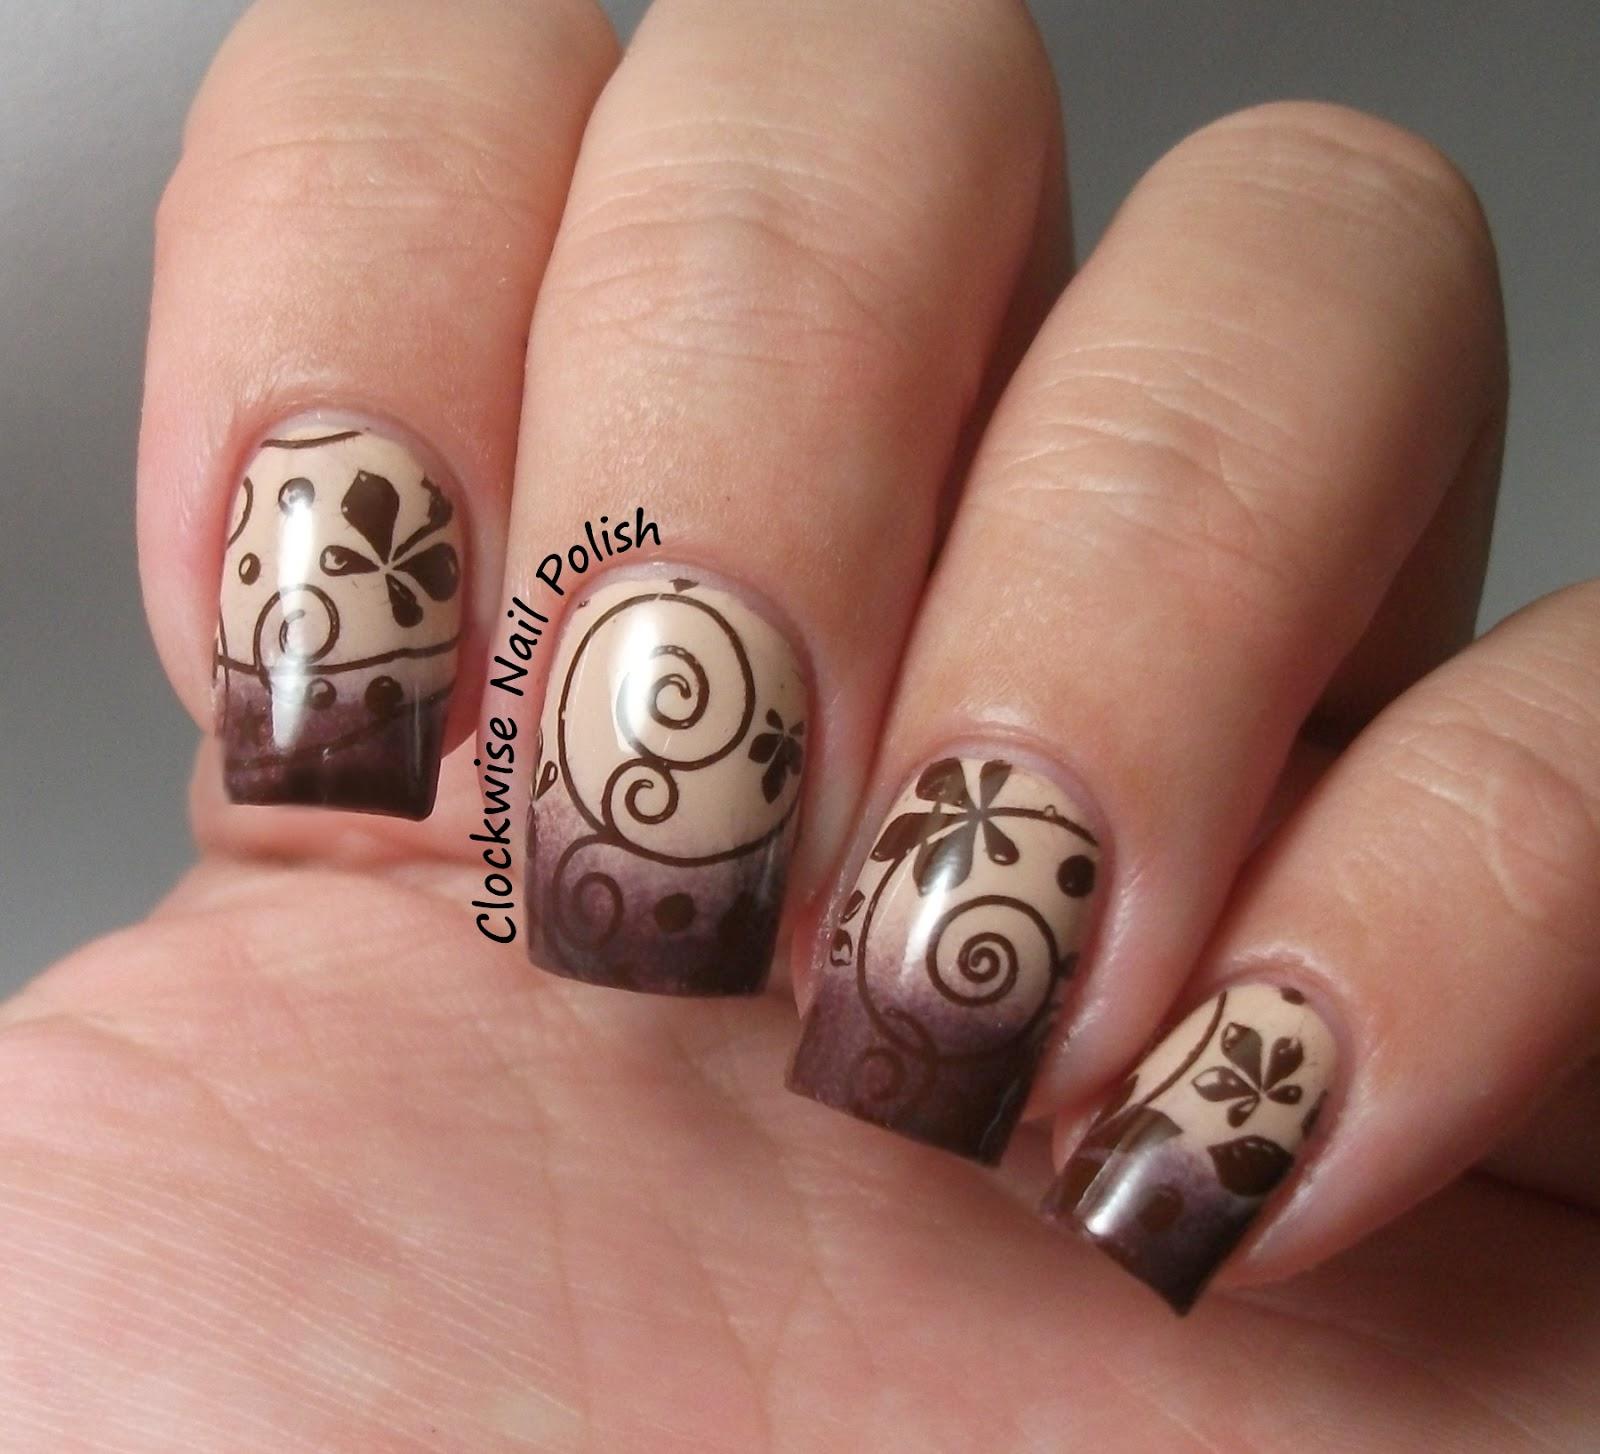 Pro Nail Designs: The Clockwise Nail Polish: Mollon Pro 199 Beige Amber